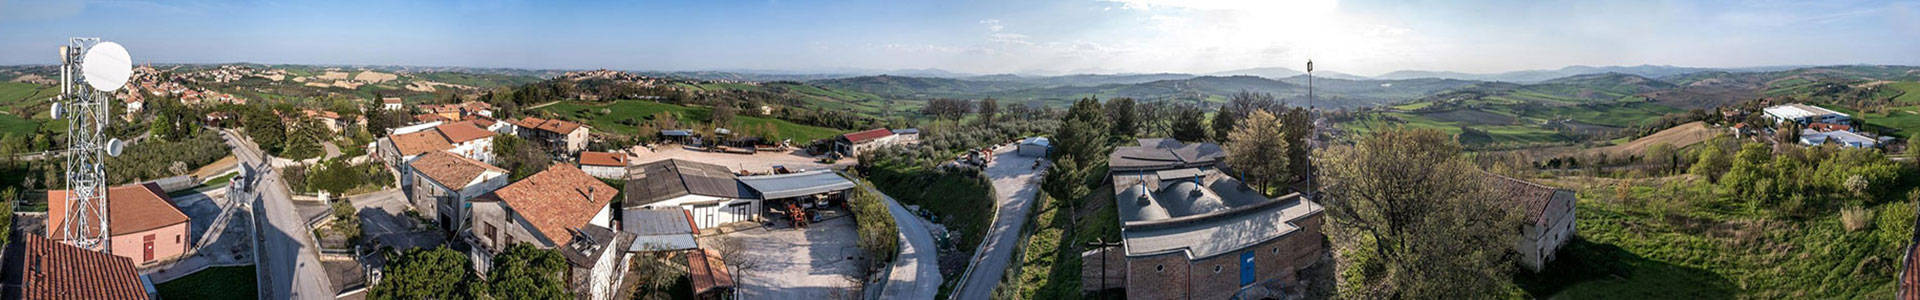 Monte-Palazzino